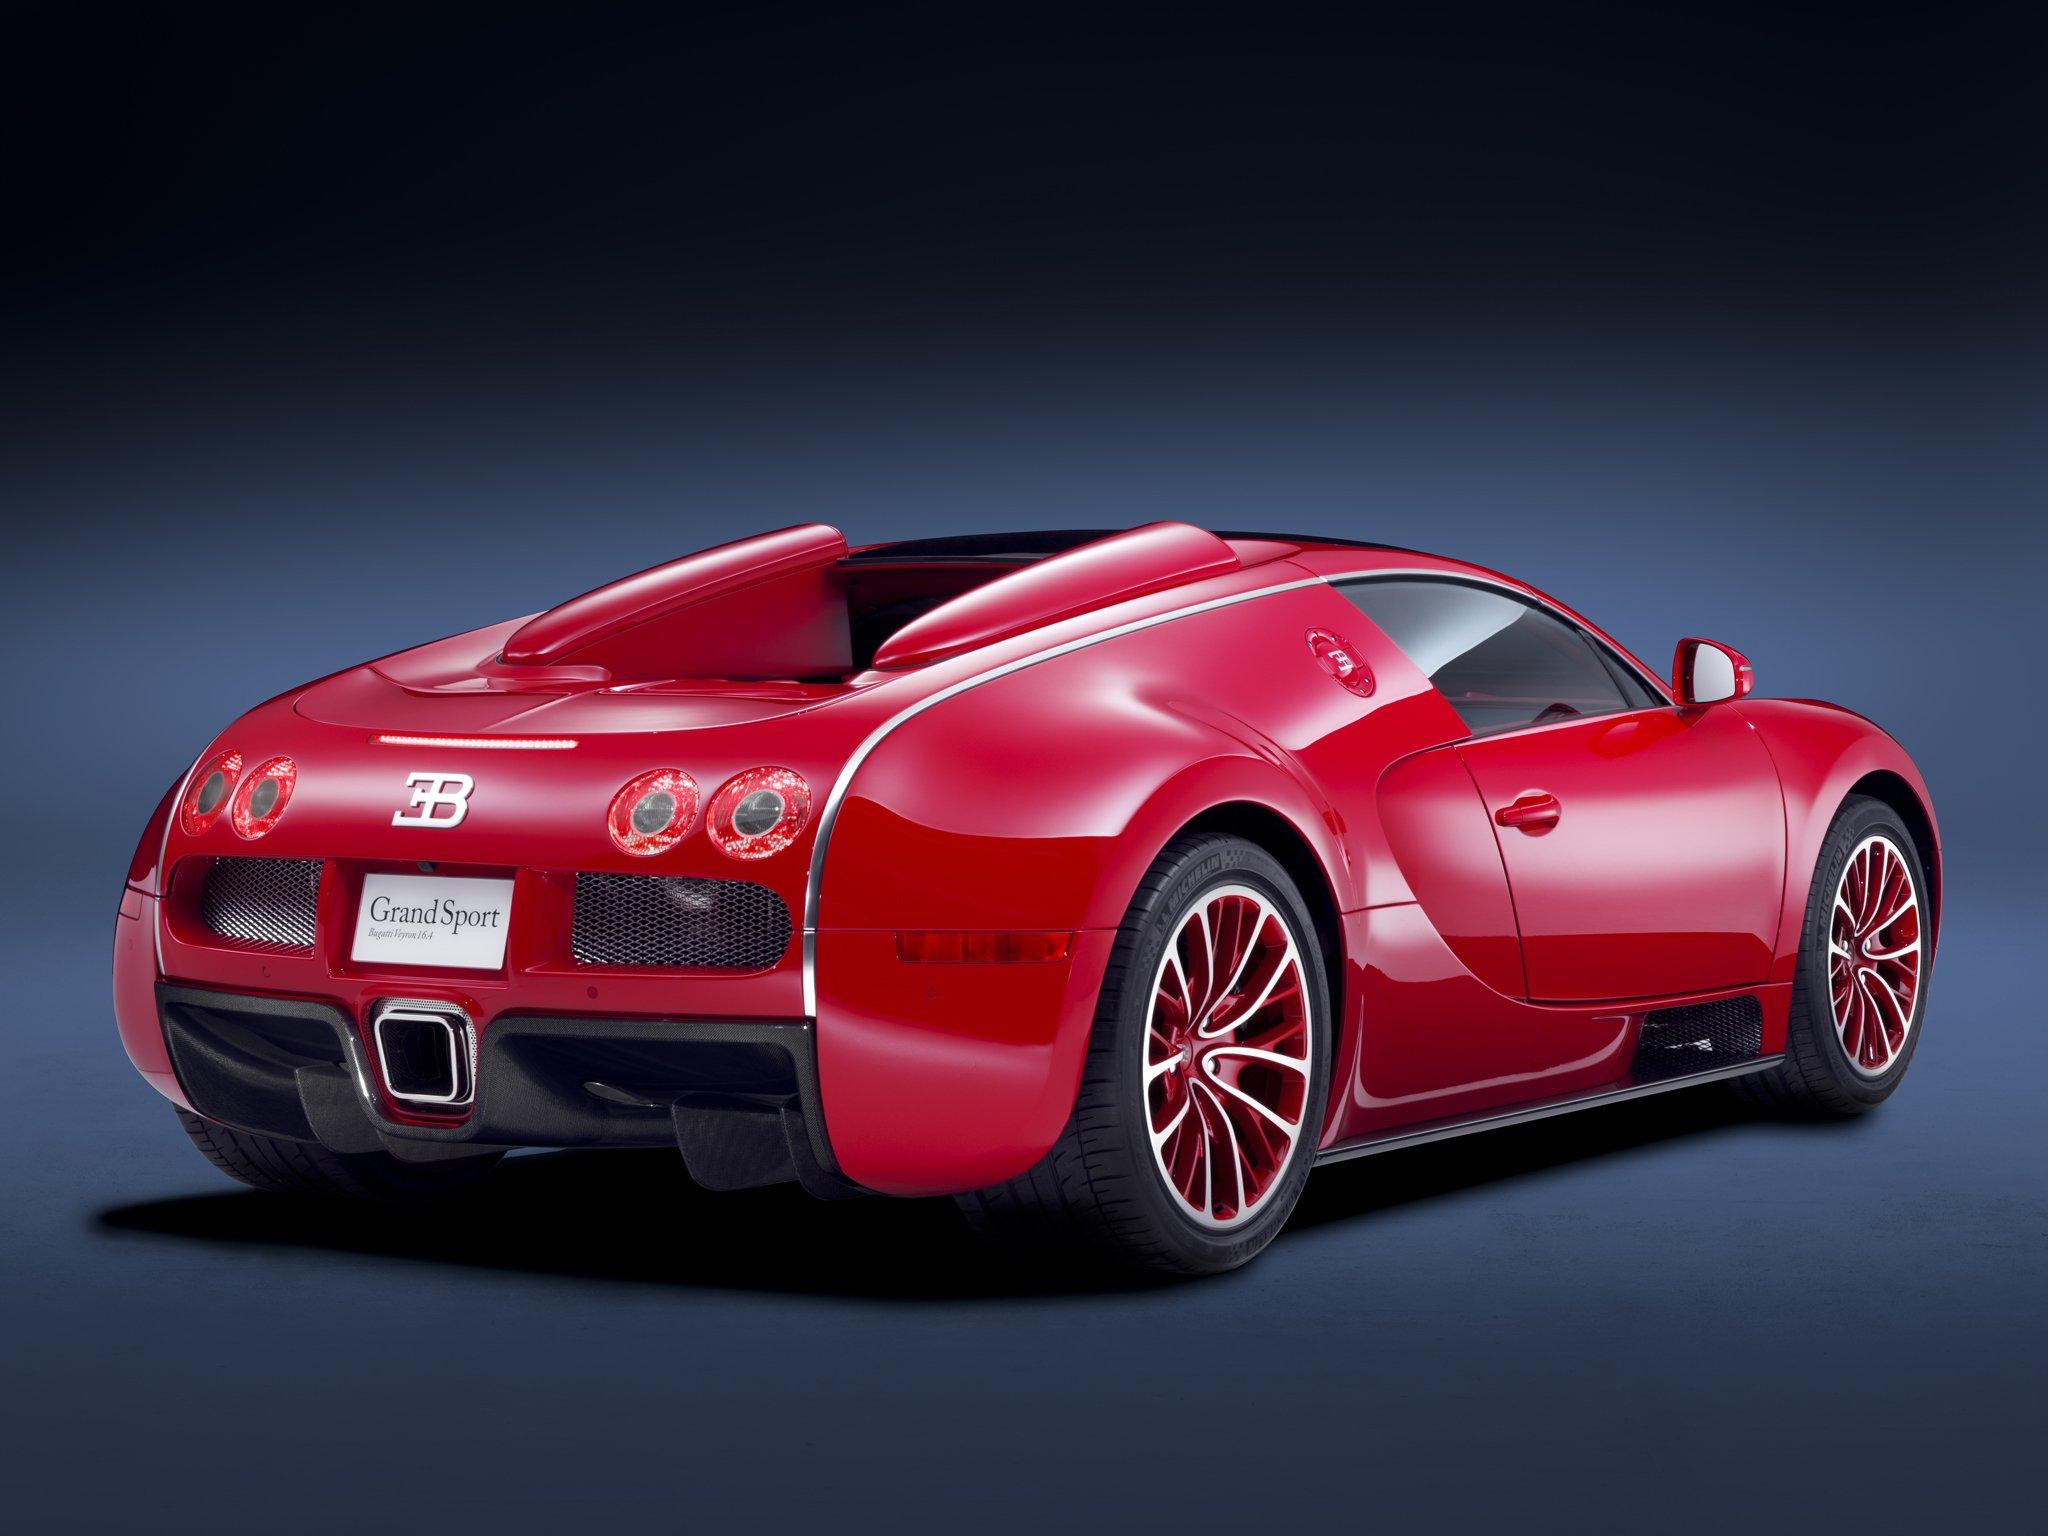 2011 Bugatti Veyron Grand Sport Roadster US-spec Supercar